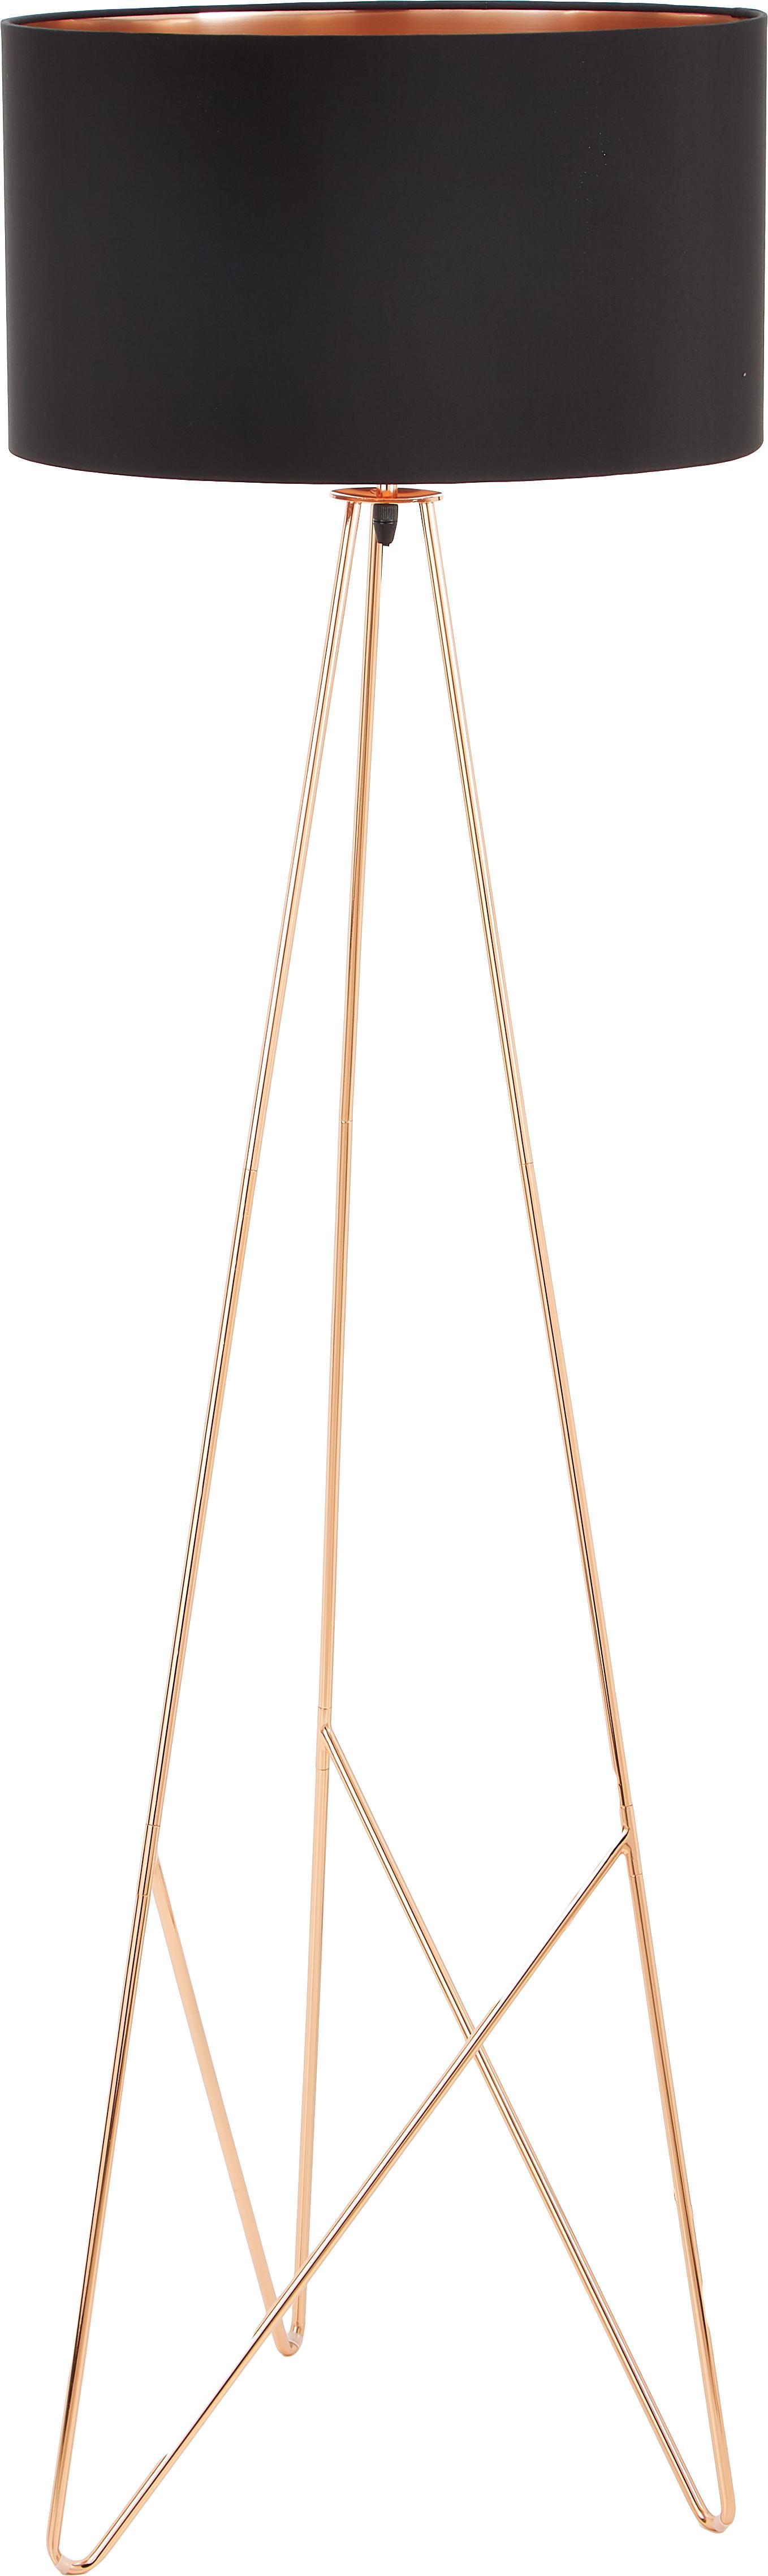 Vloerlamp Camporale in koperkleur, Lampvoet: gelakt staal, Zwart, koperkleurig, Ø 45 x H 154 cm